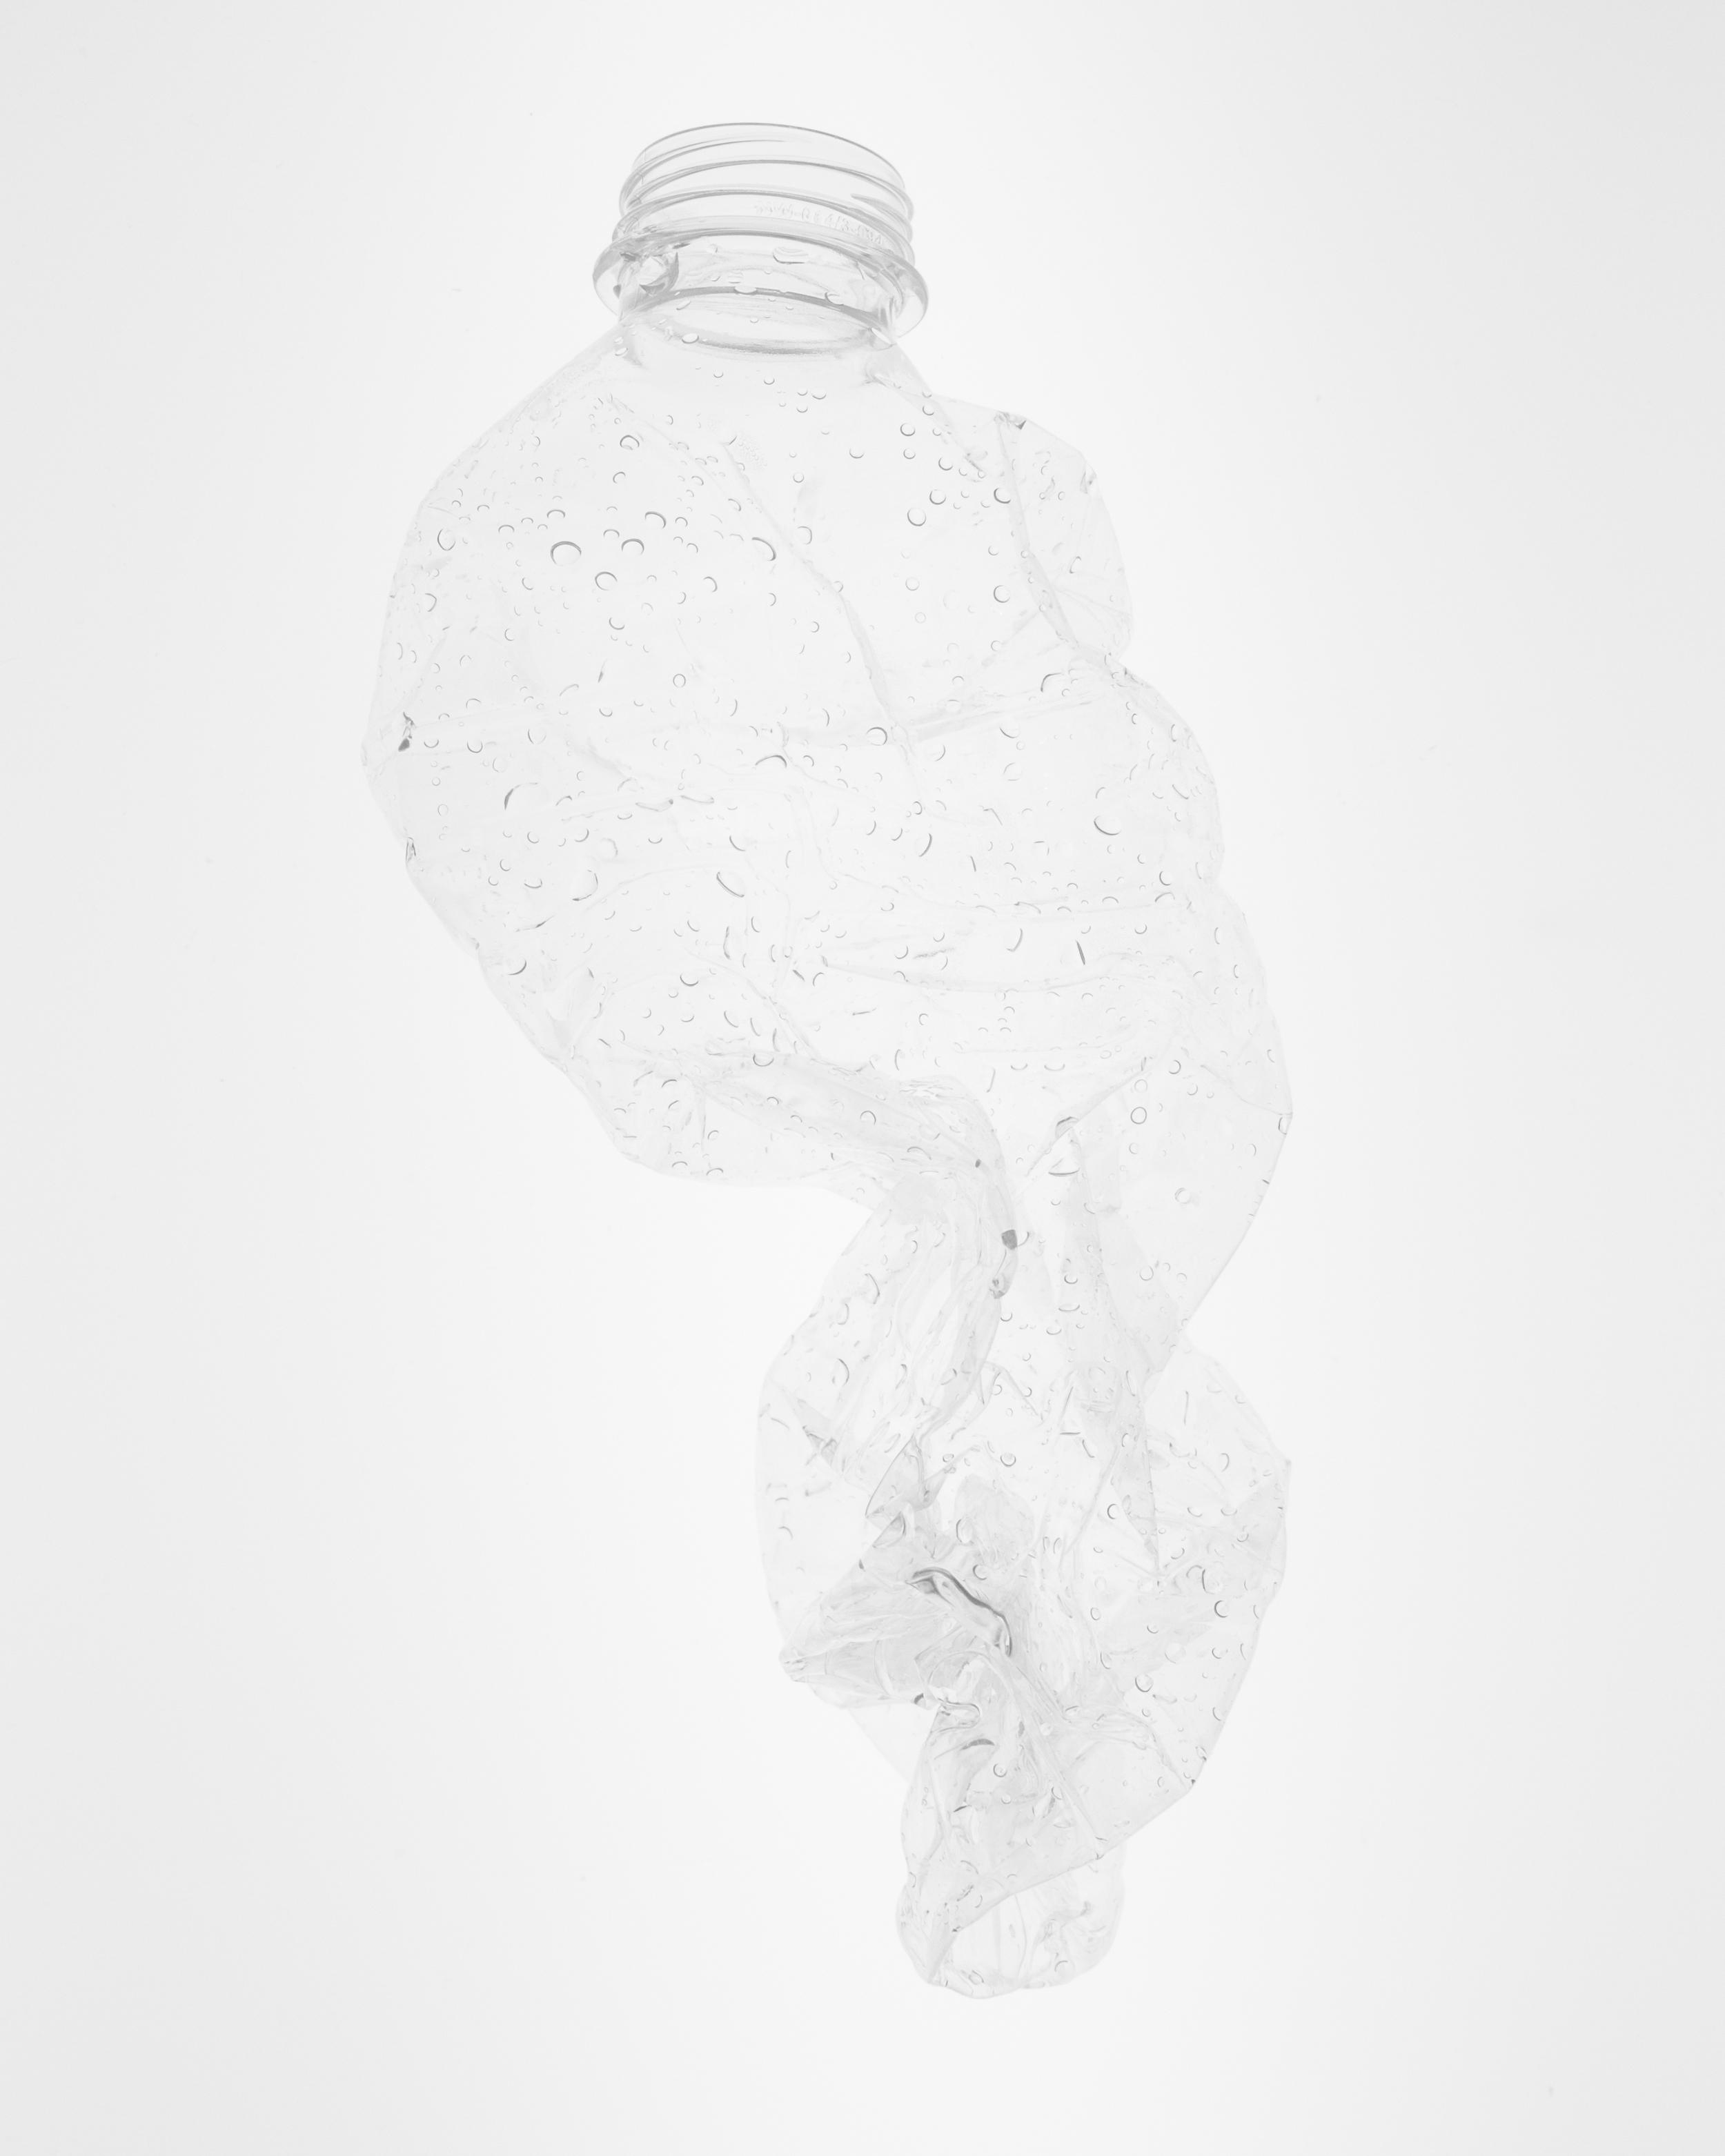 Bottle No.28, 10x8, Inkjet Print, 2014